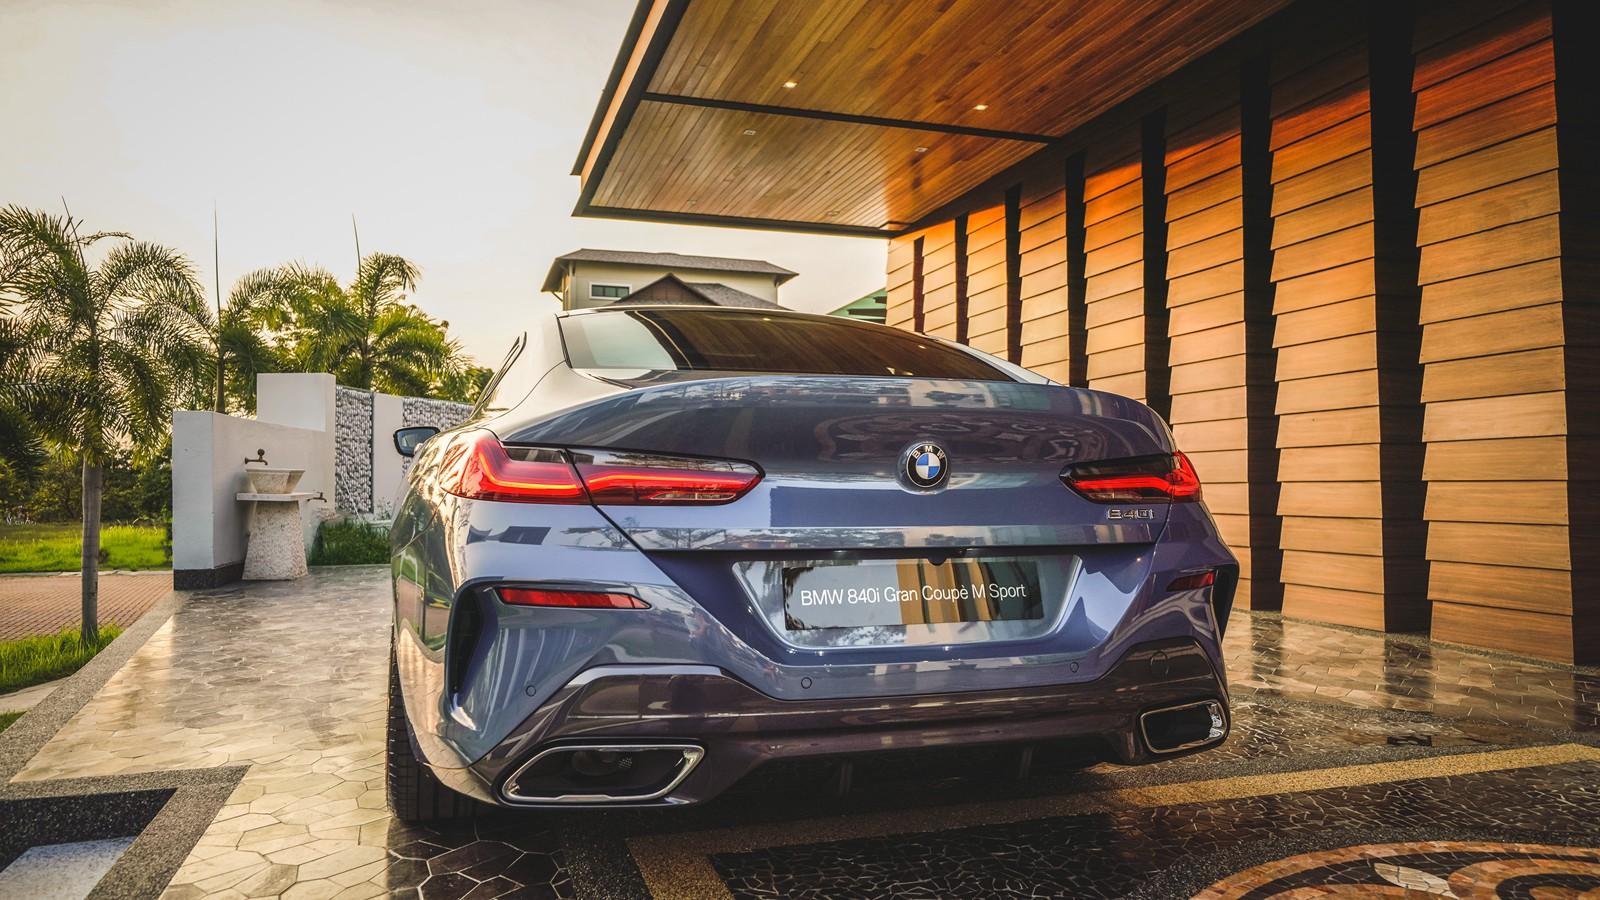 2020 BMW 8 Series 840i Gran Coupé M Sport Exterior 006